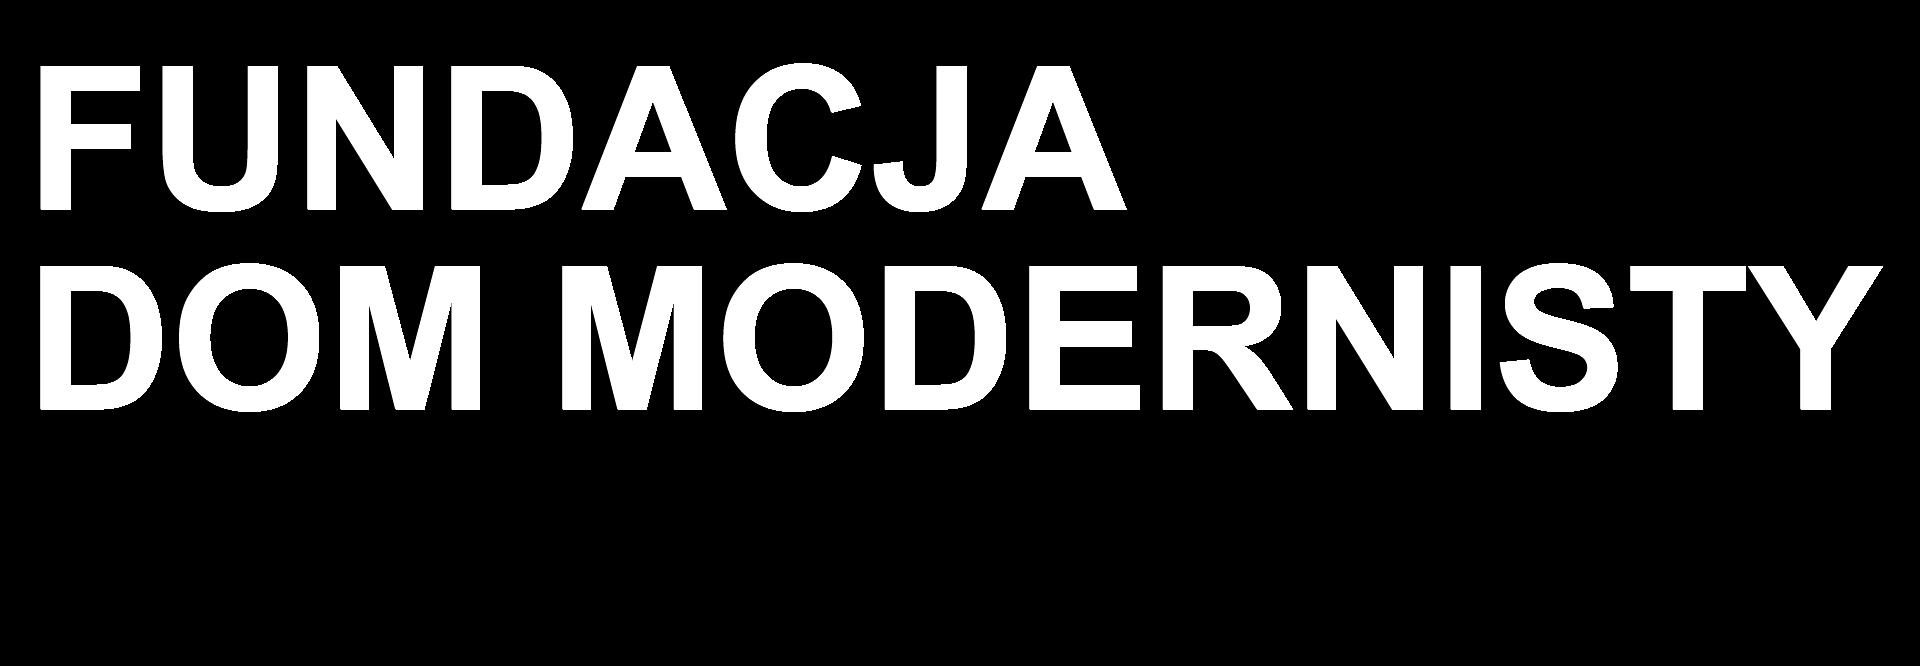 FUNDACJA DOM MODERNISTY